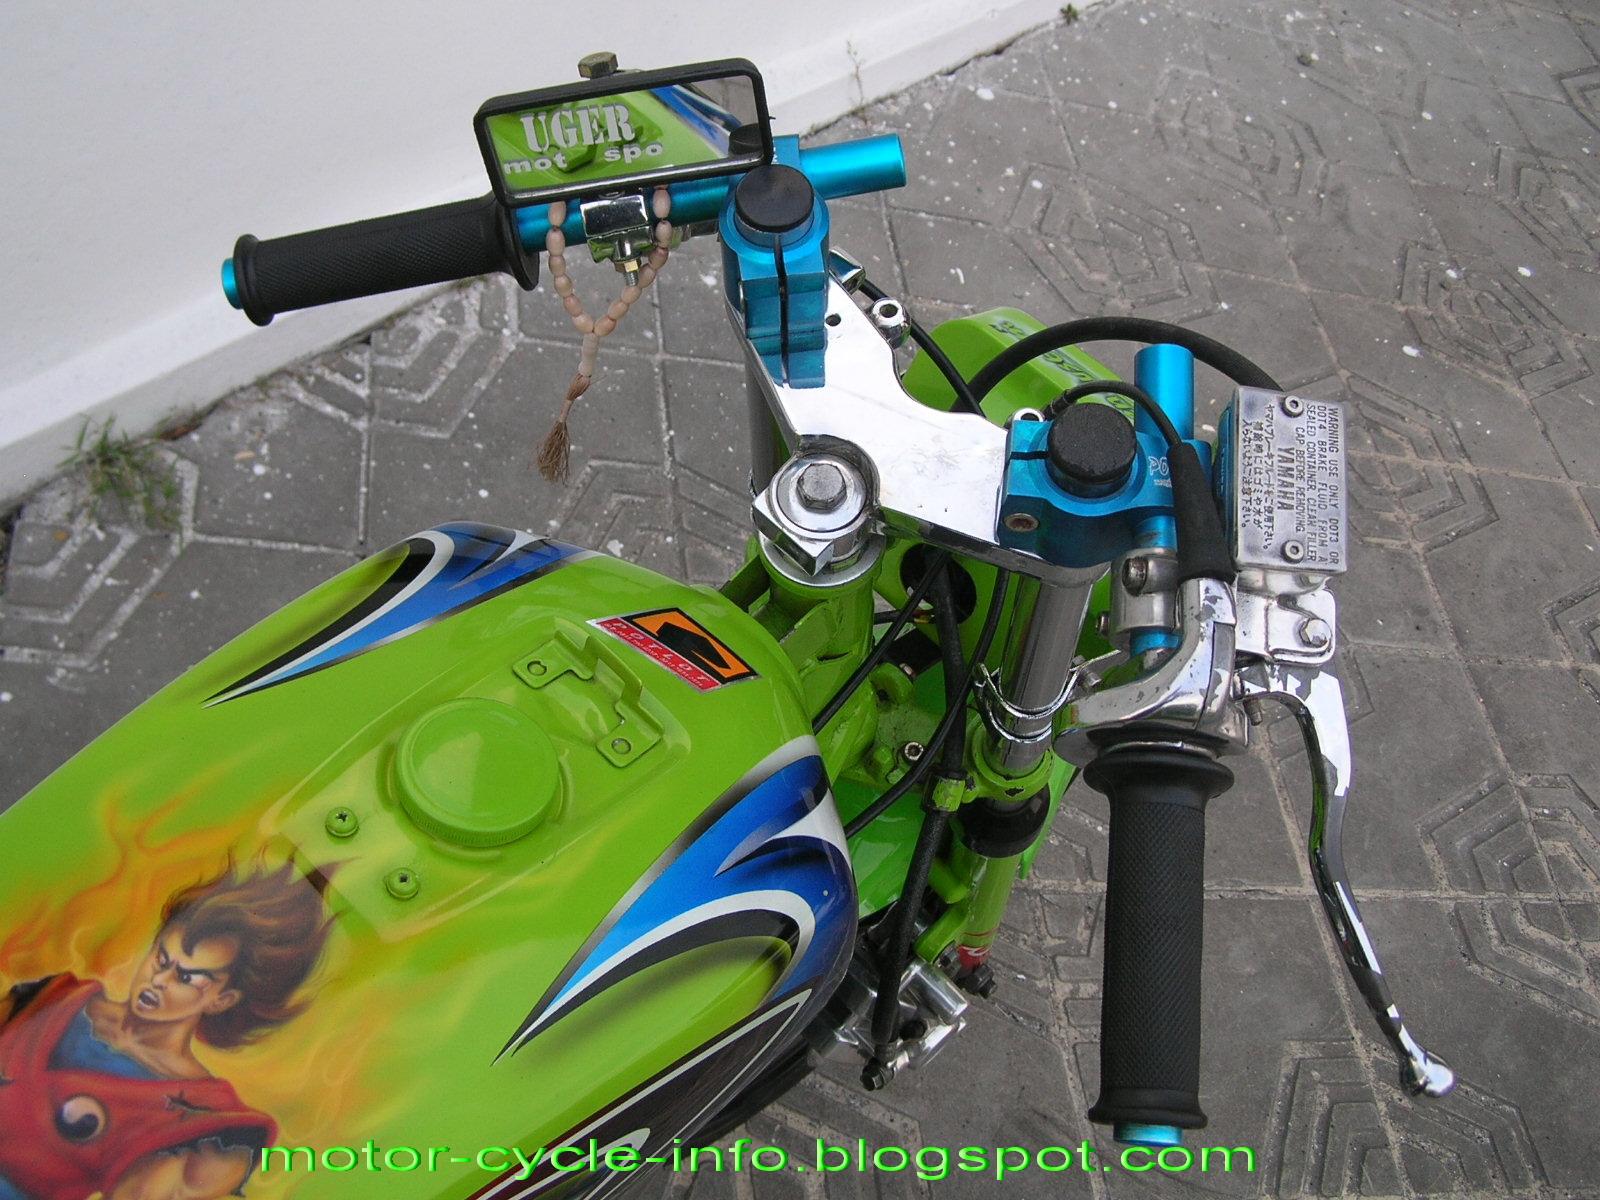 Modif Motor Rx King Warna Hijau Modifikasi Motor Yamaha